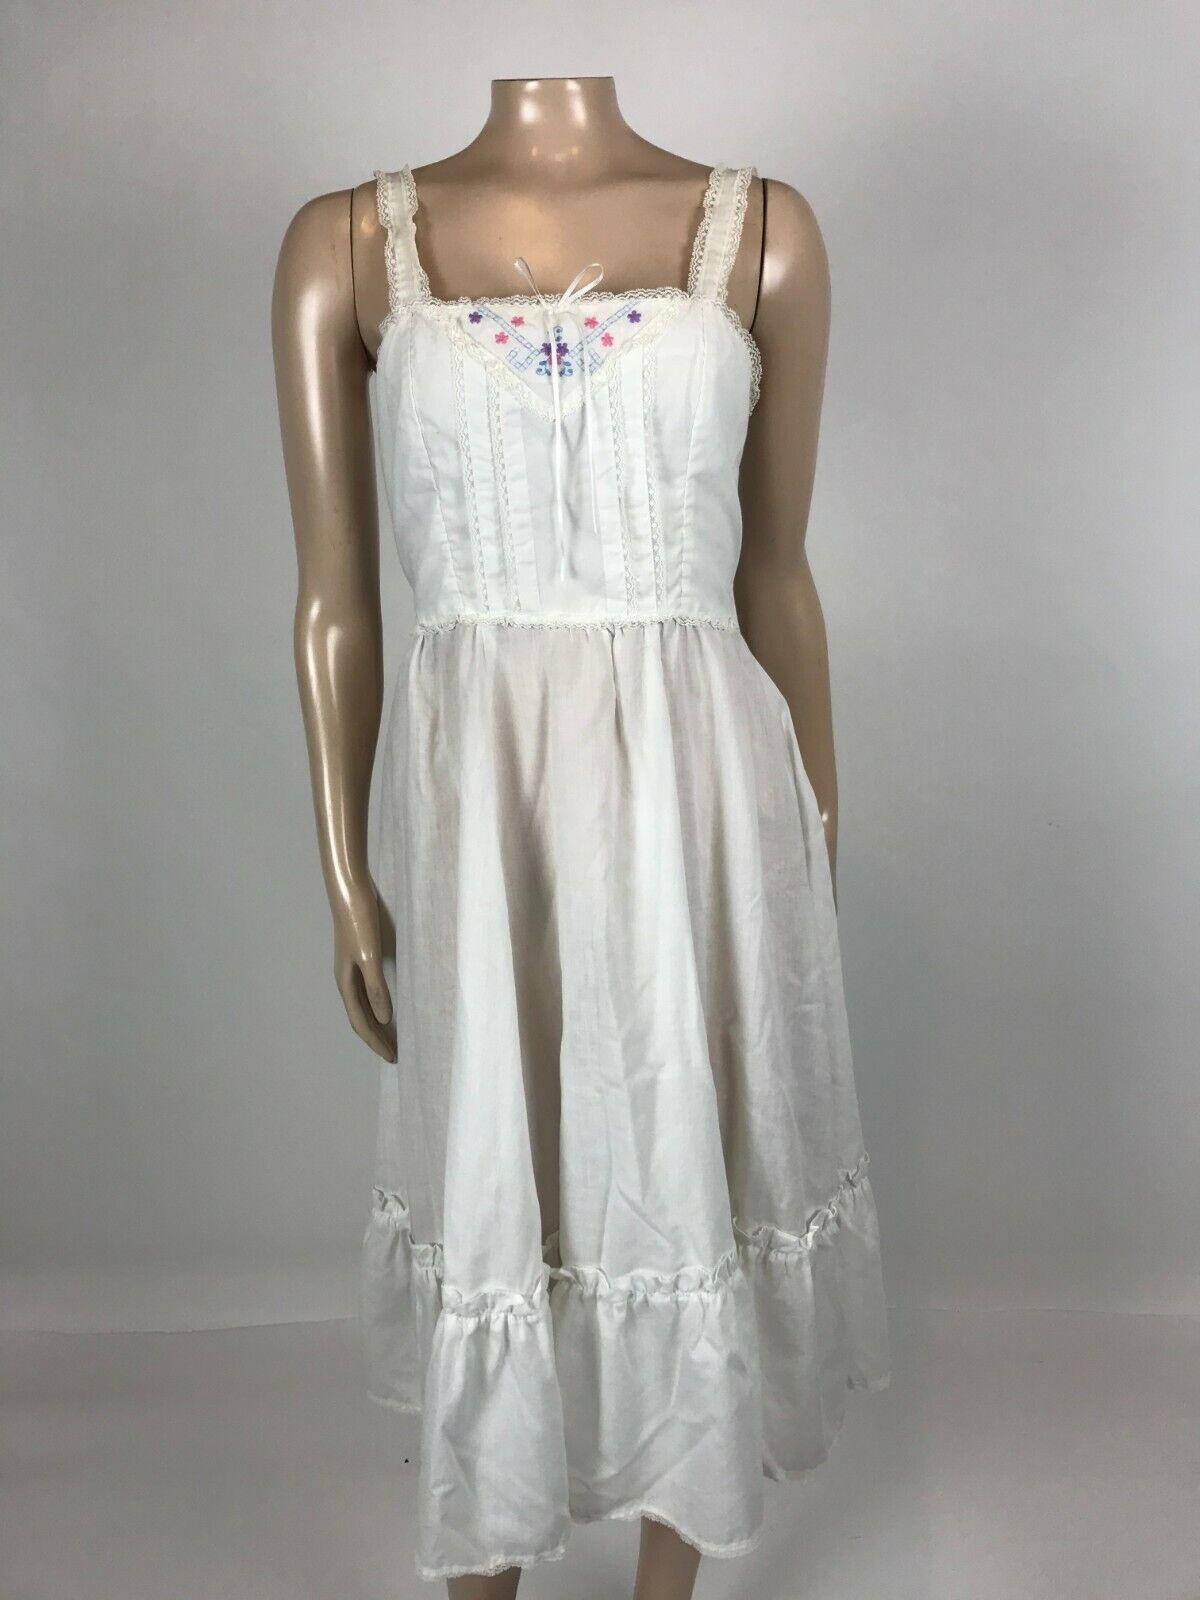 Vintage 70's Gunne Sax Women's Dress 9 cotton Flo… - image 1